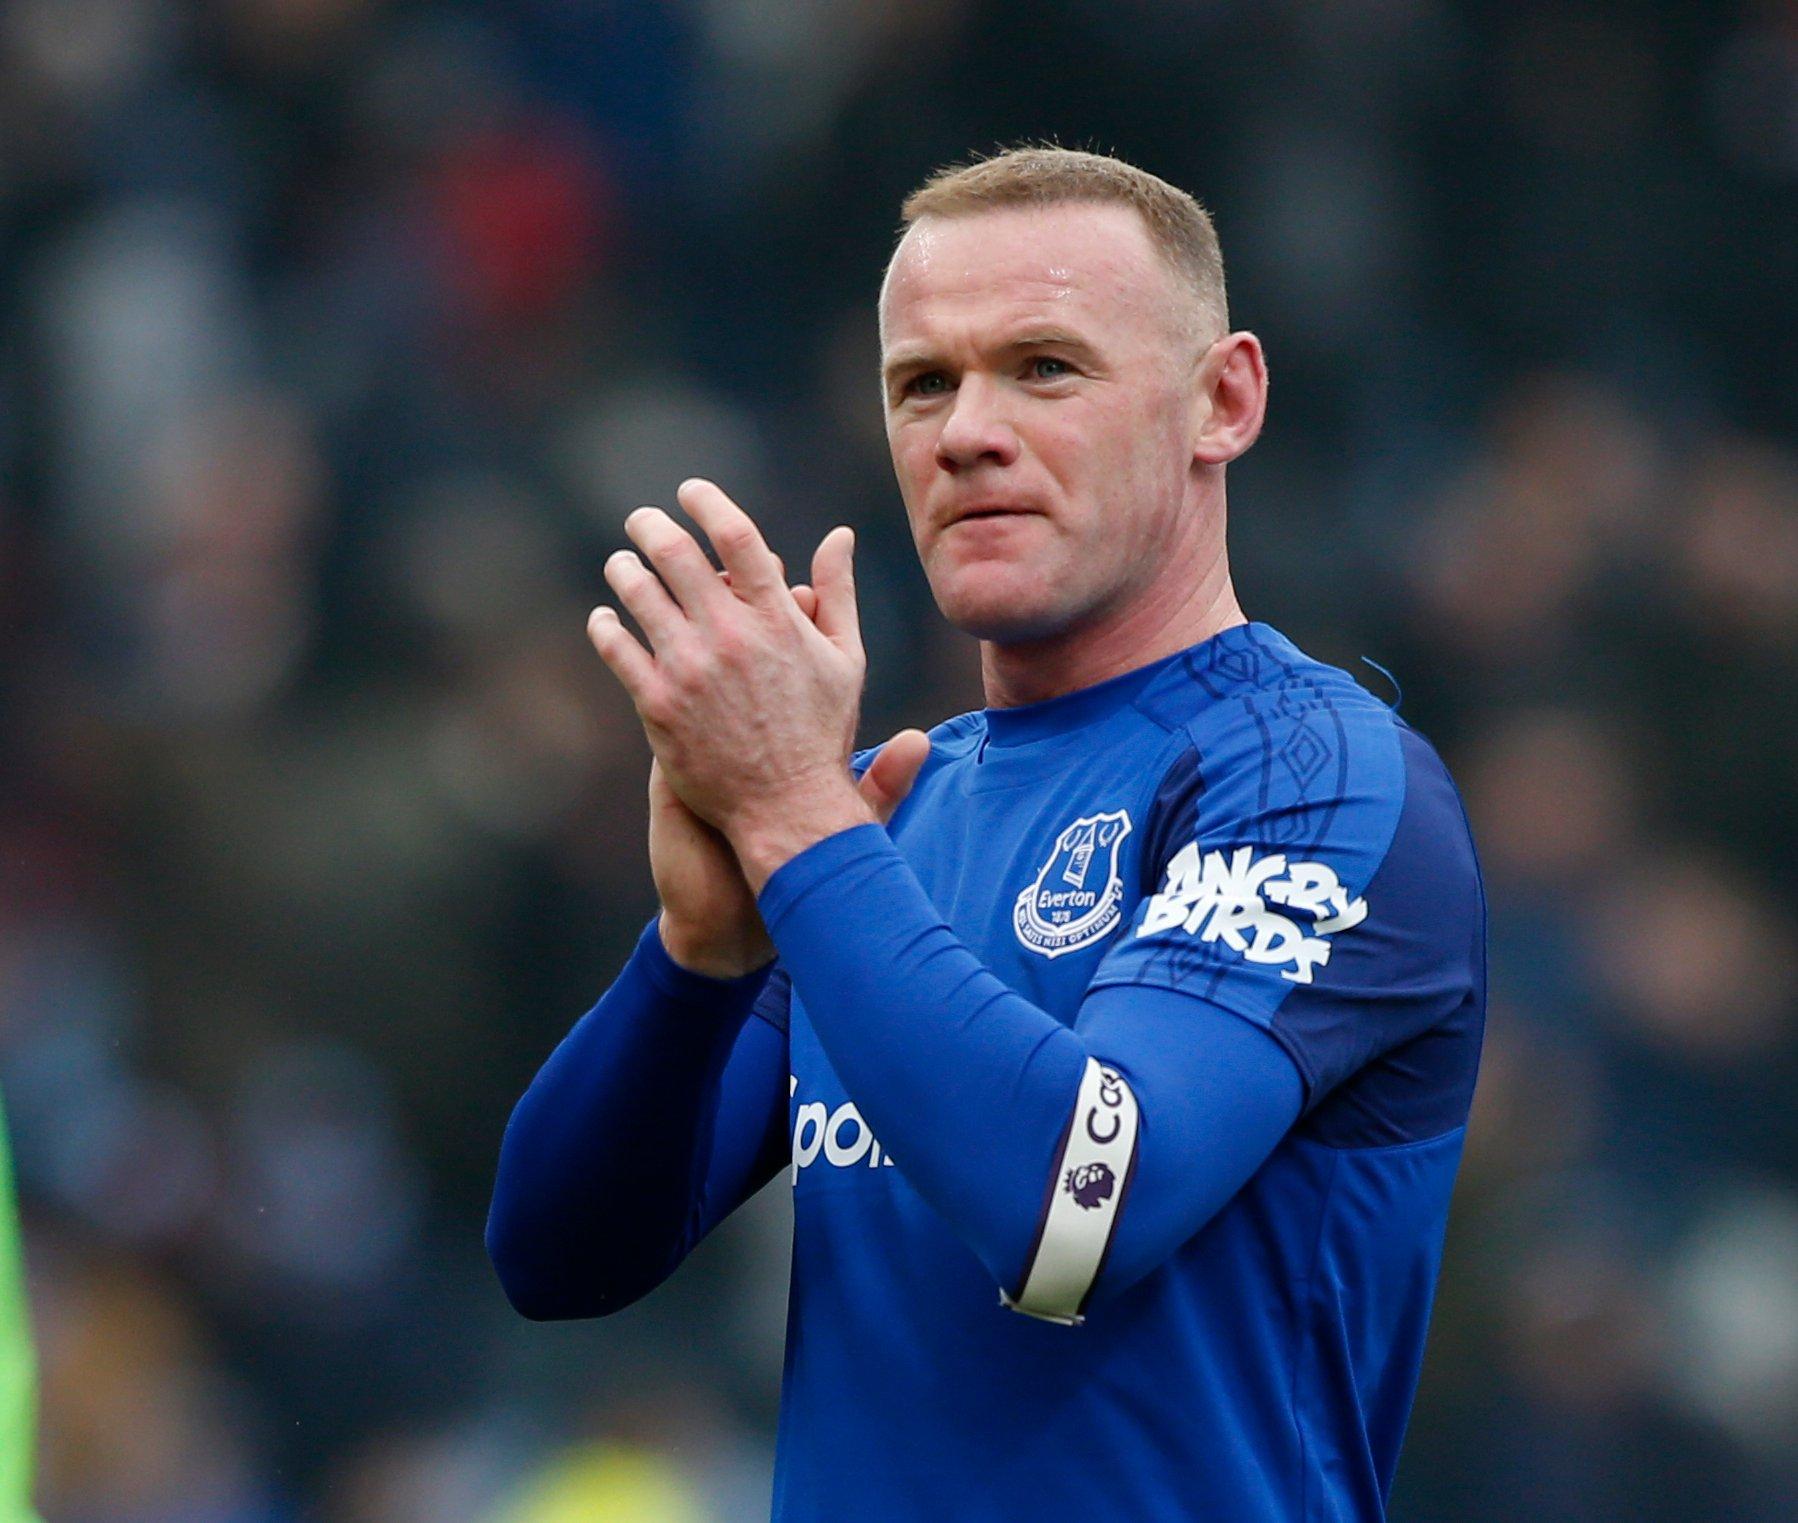 Wayn Rooney